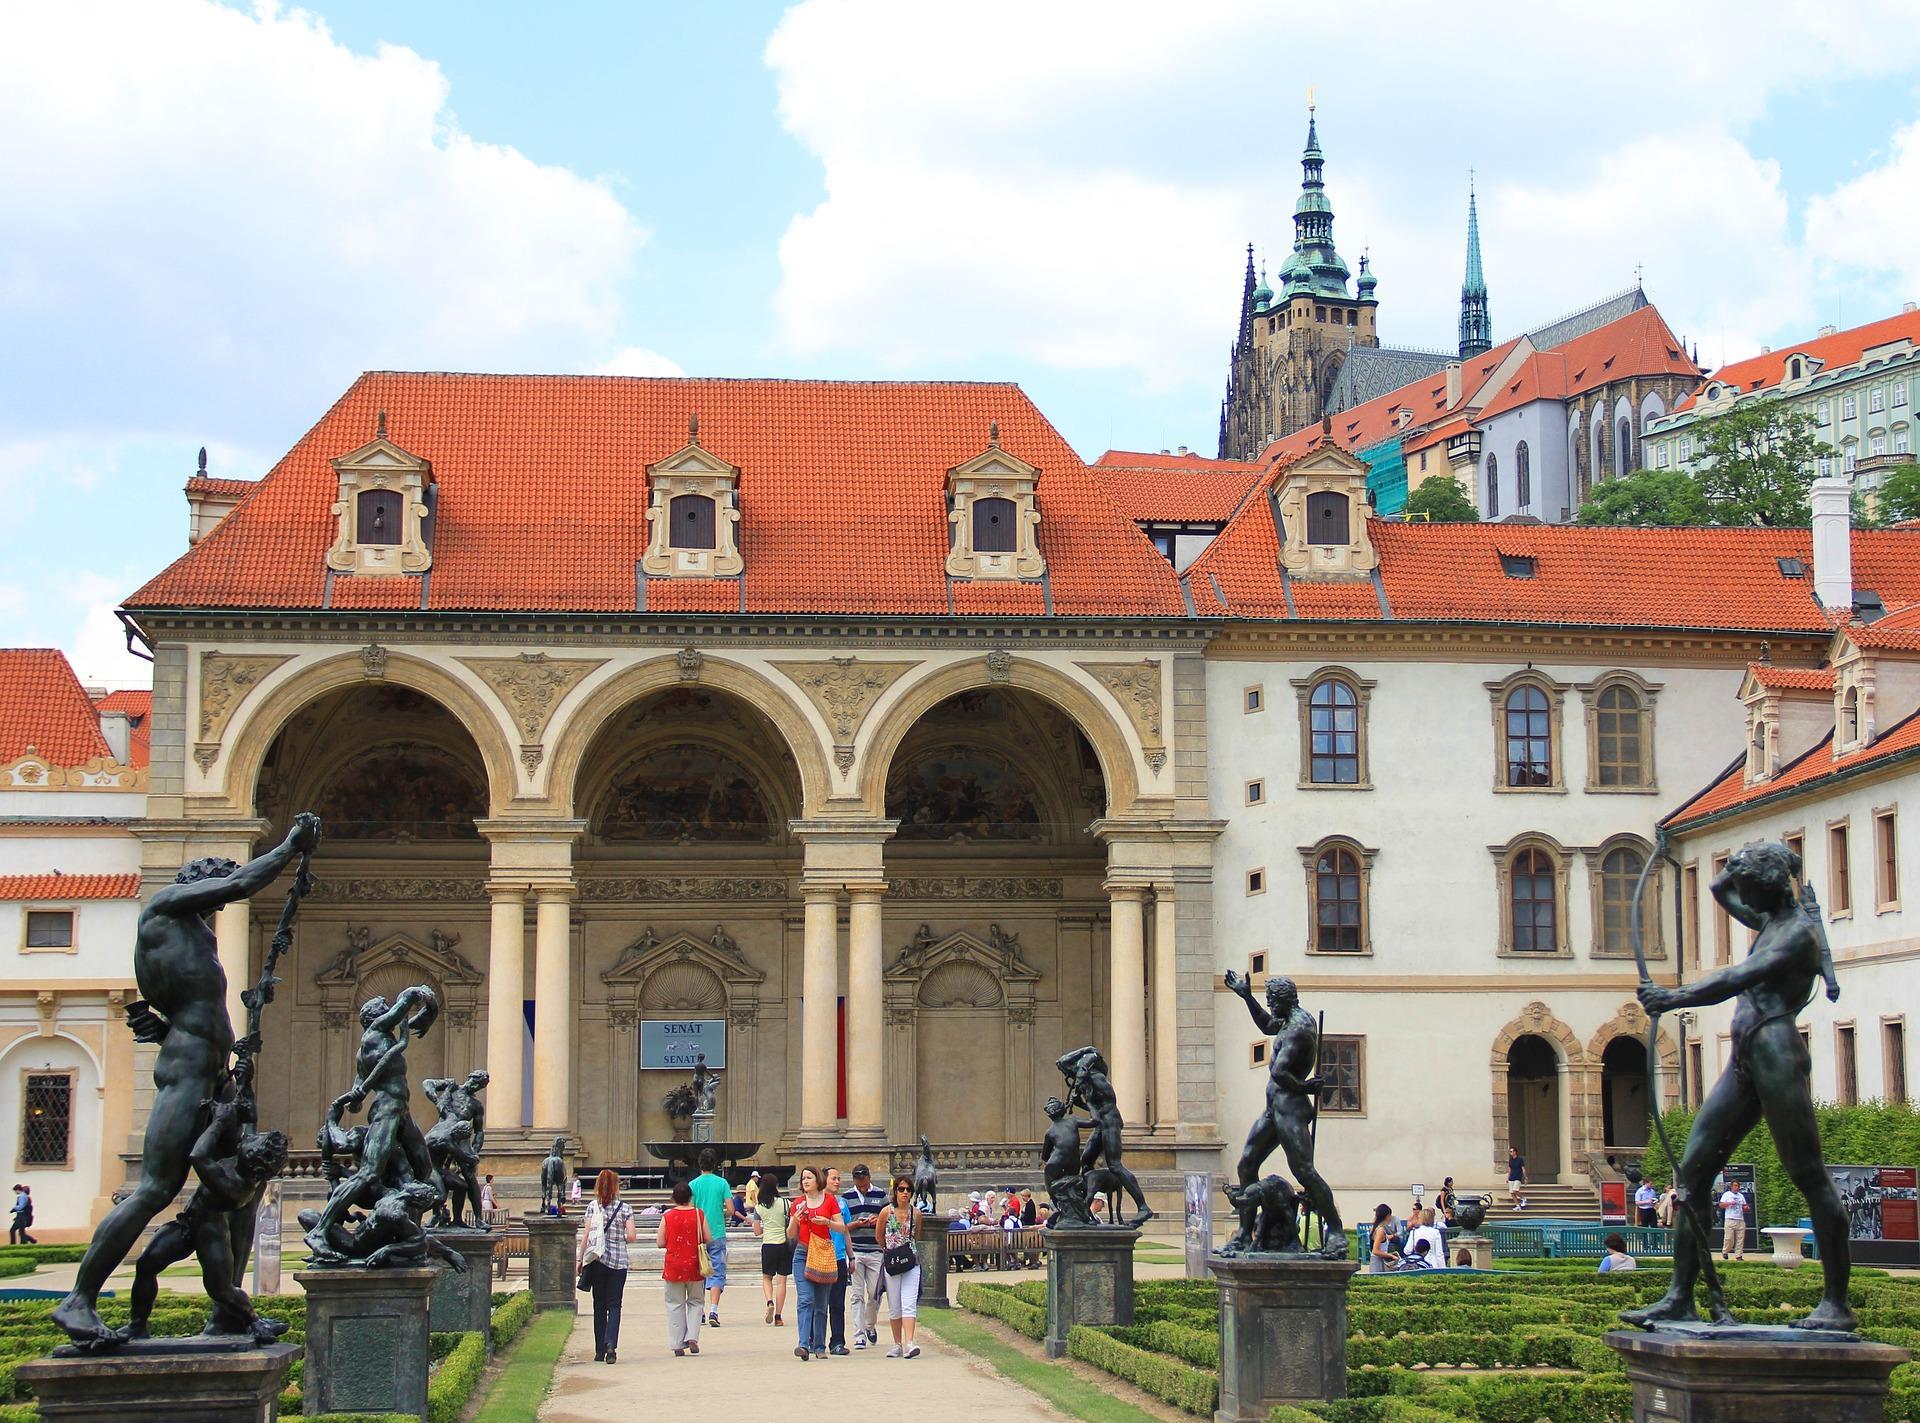 prague-castle-and-mala-strana-district-tour-36